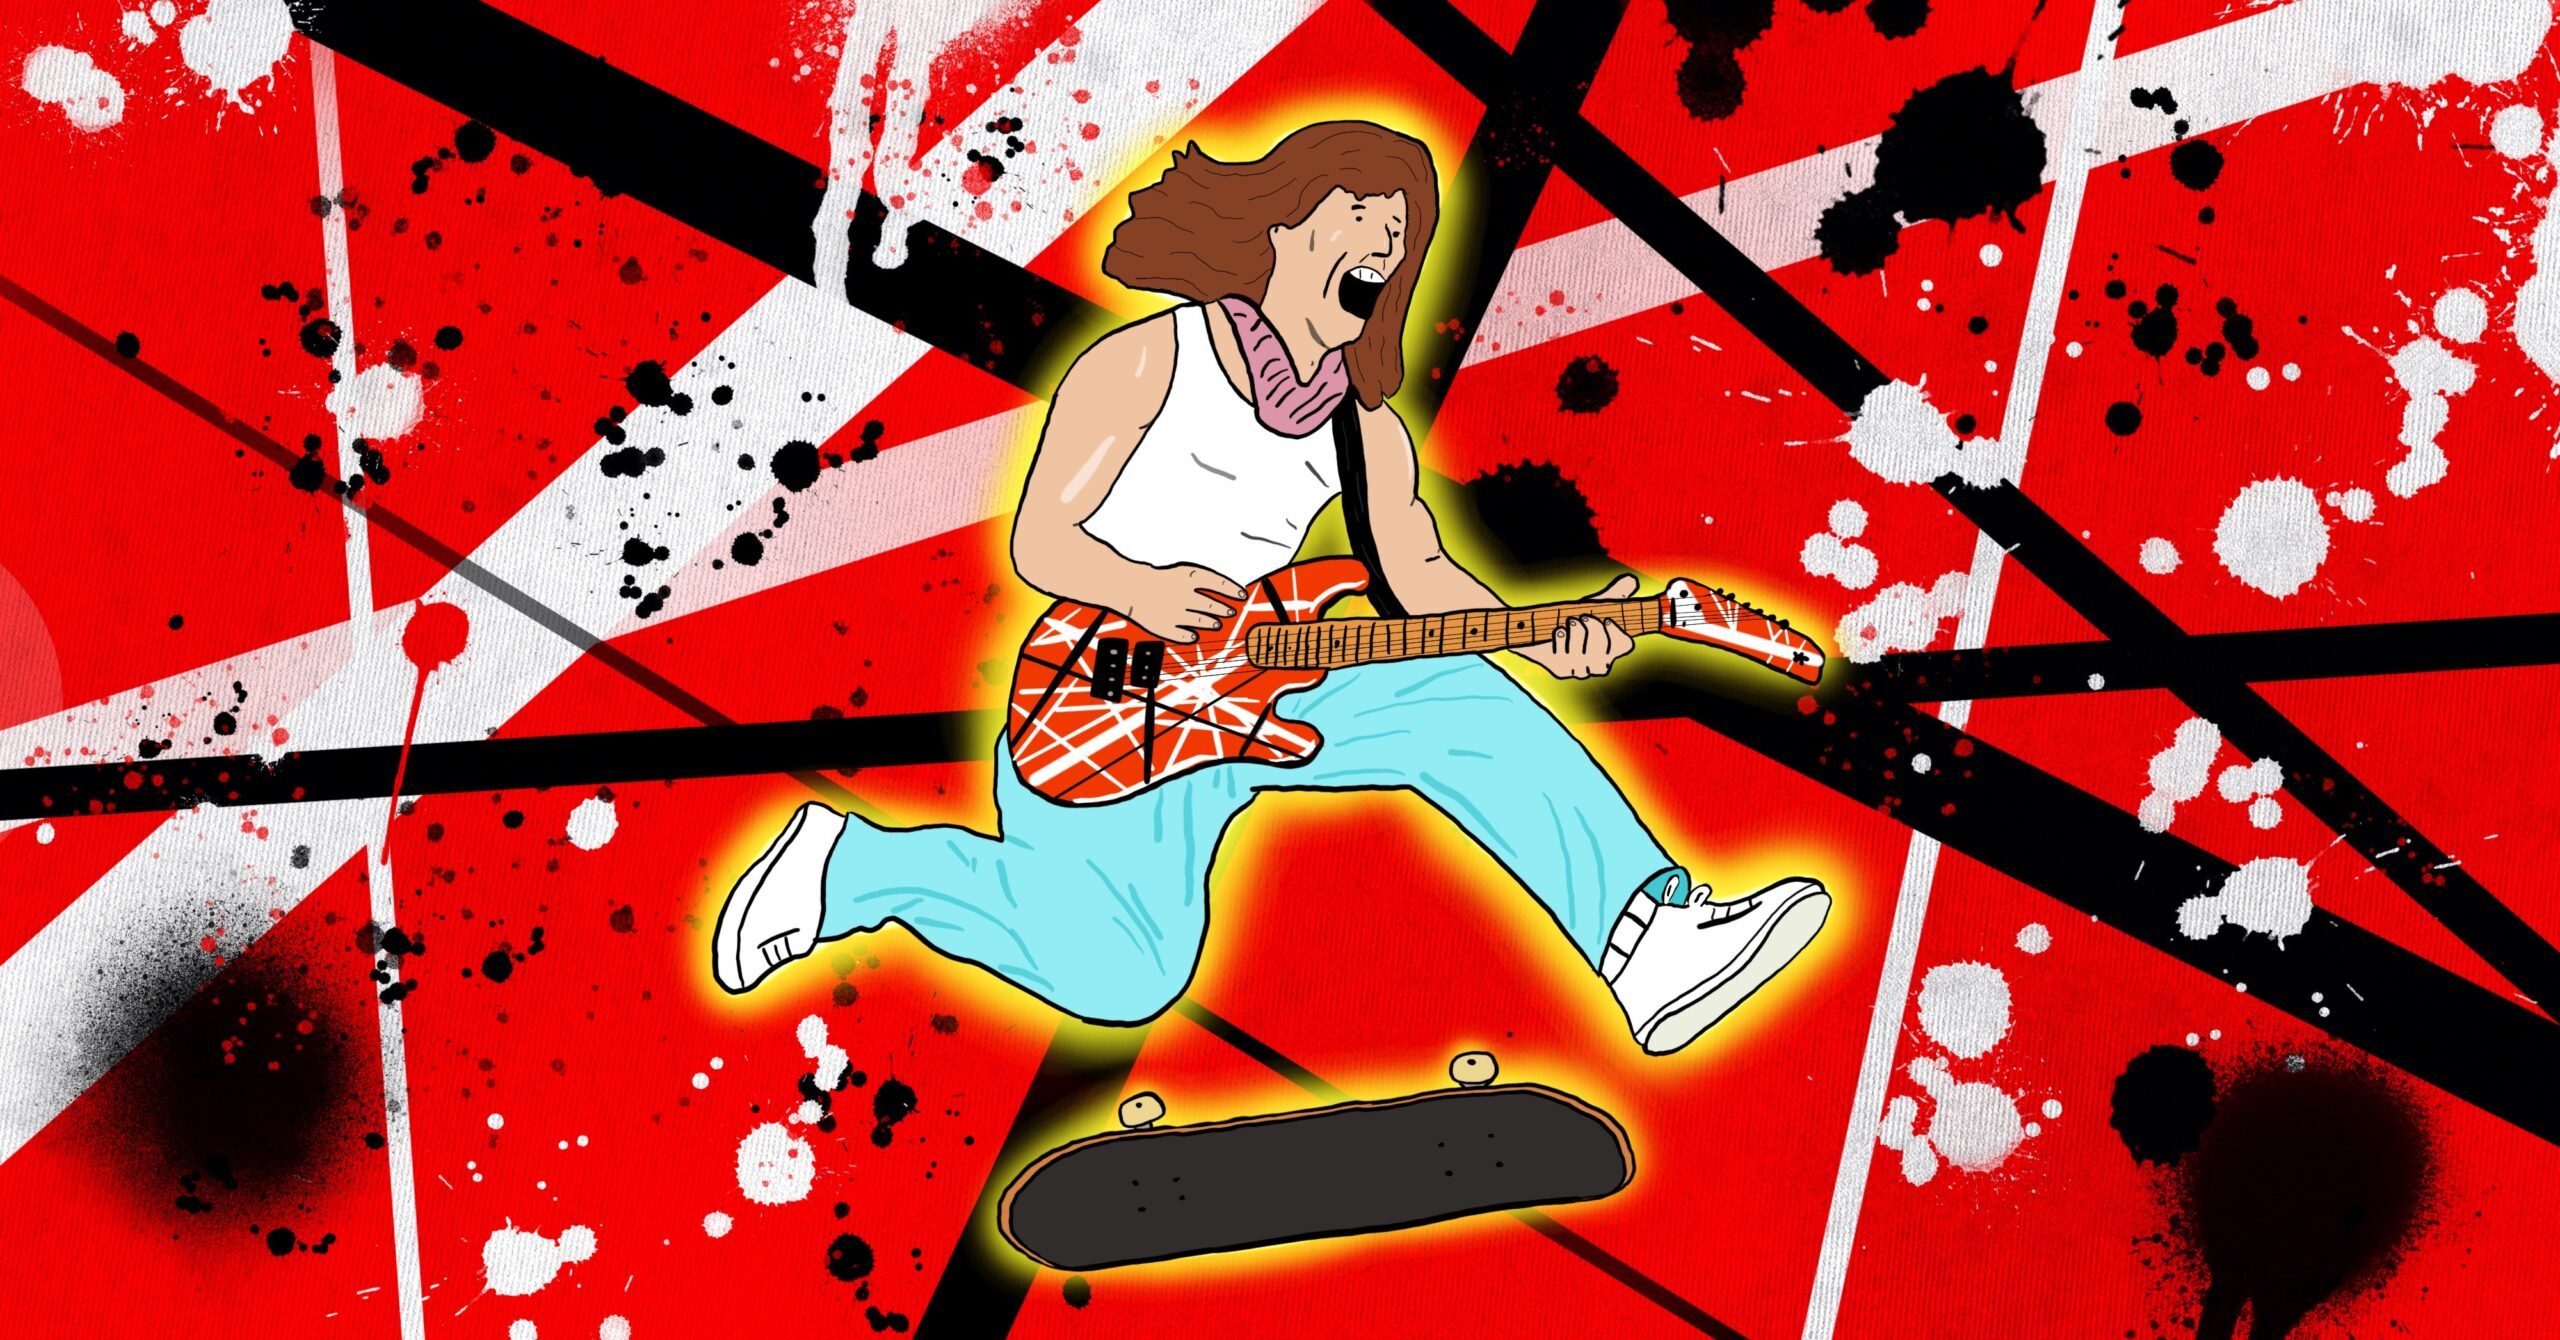 Eddie Van Halen's Contribution To Skateboarding